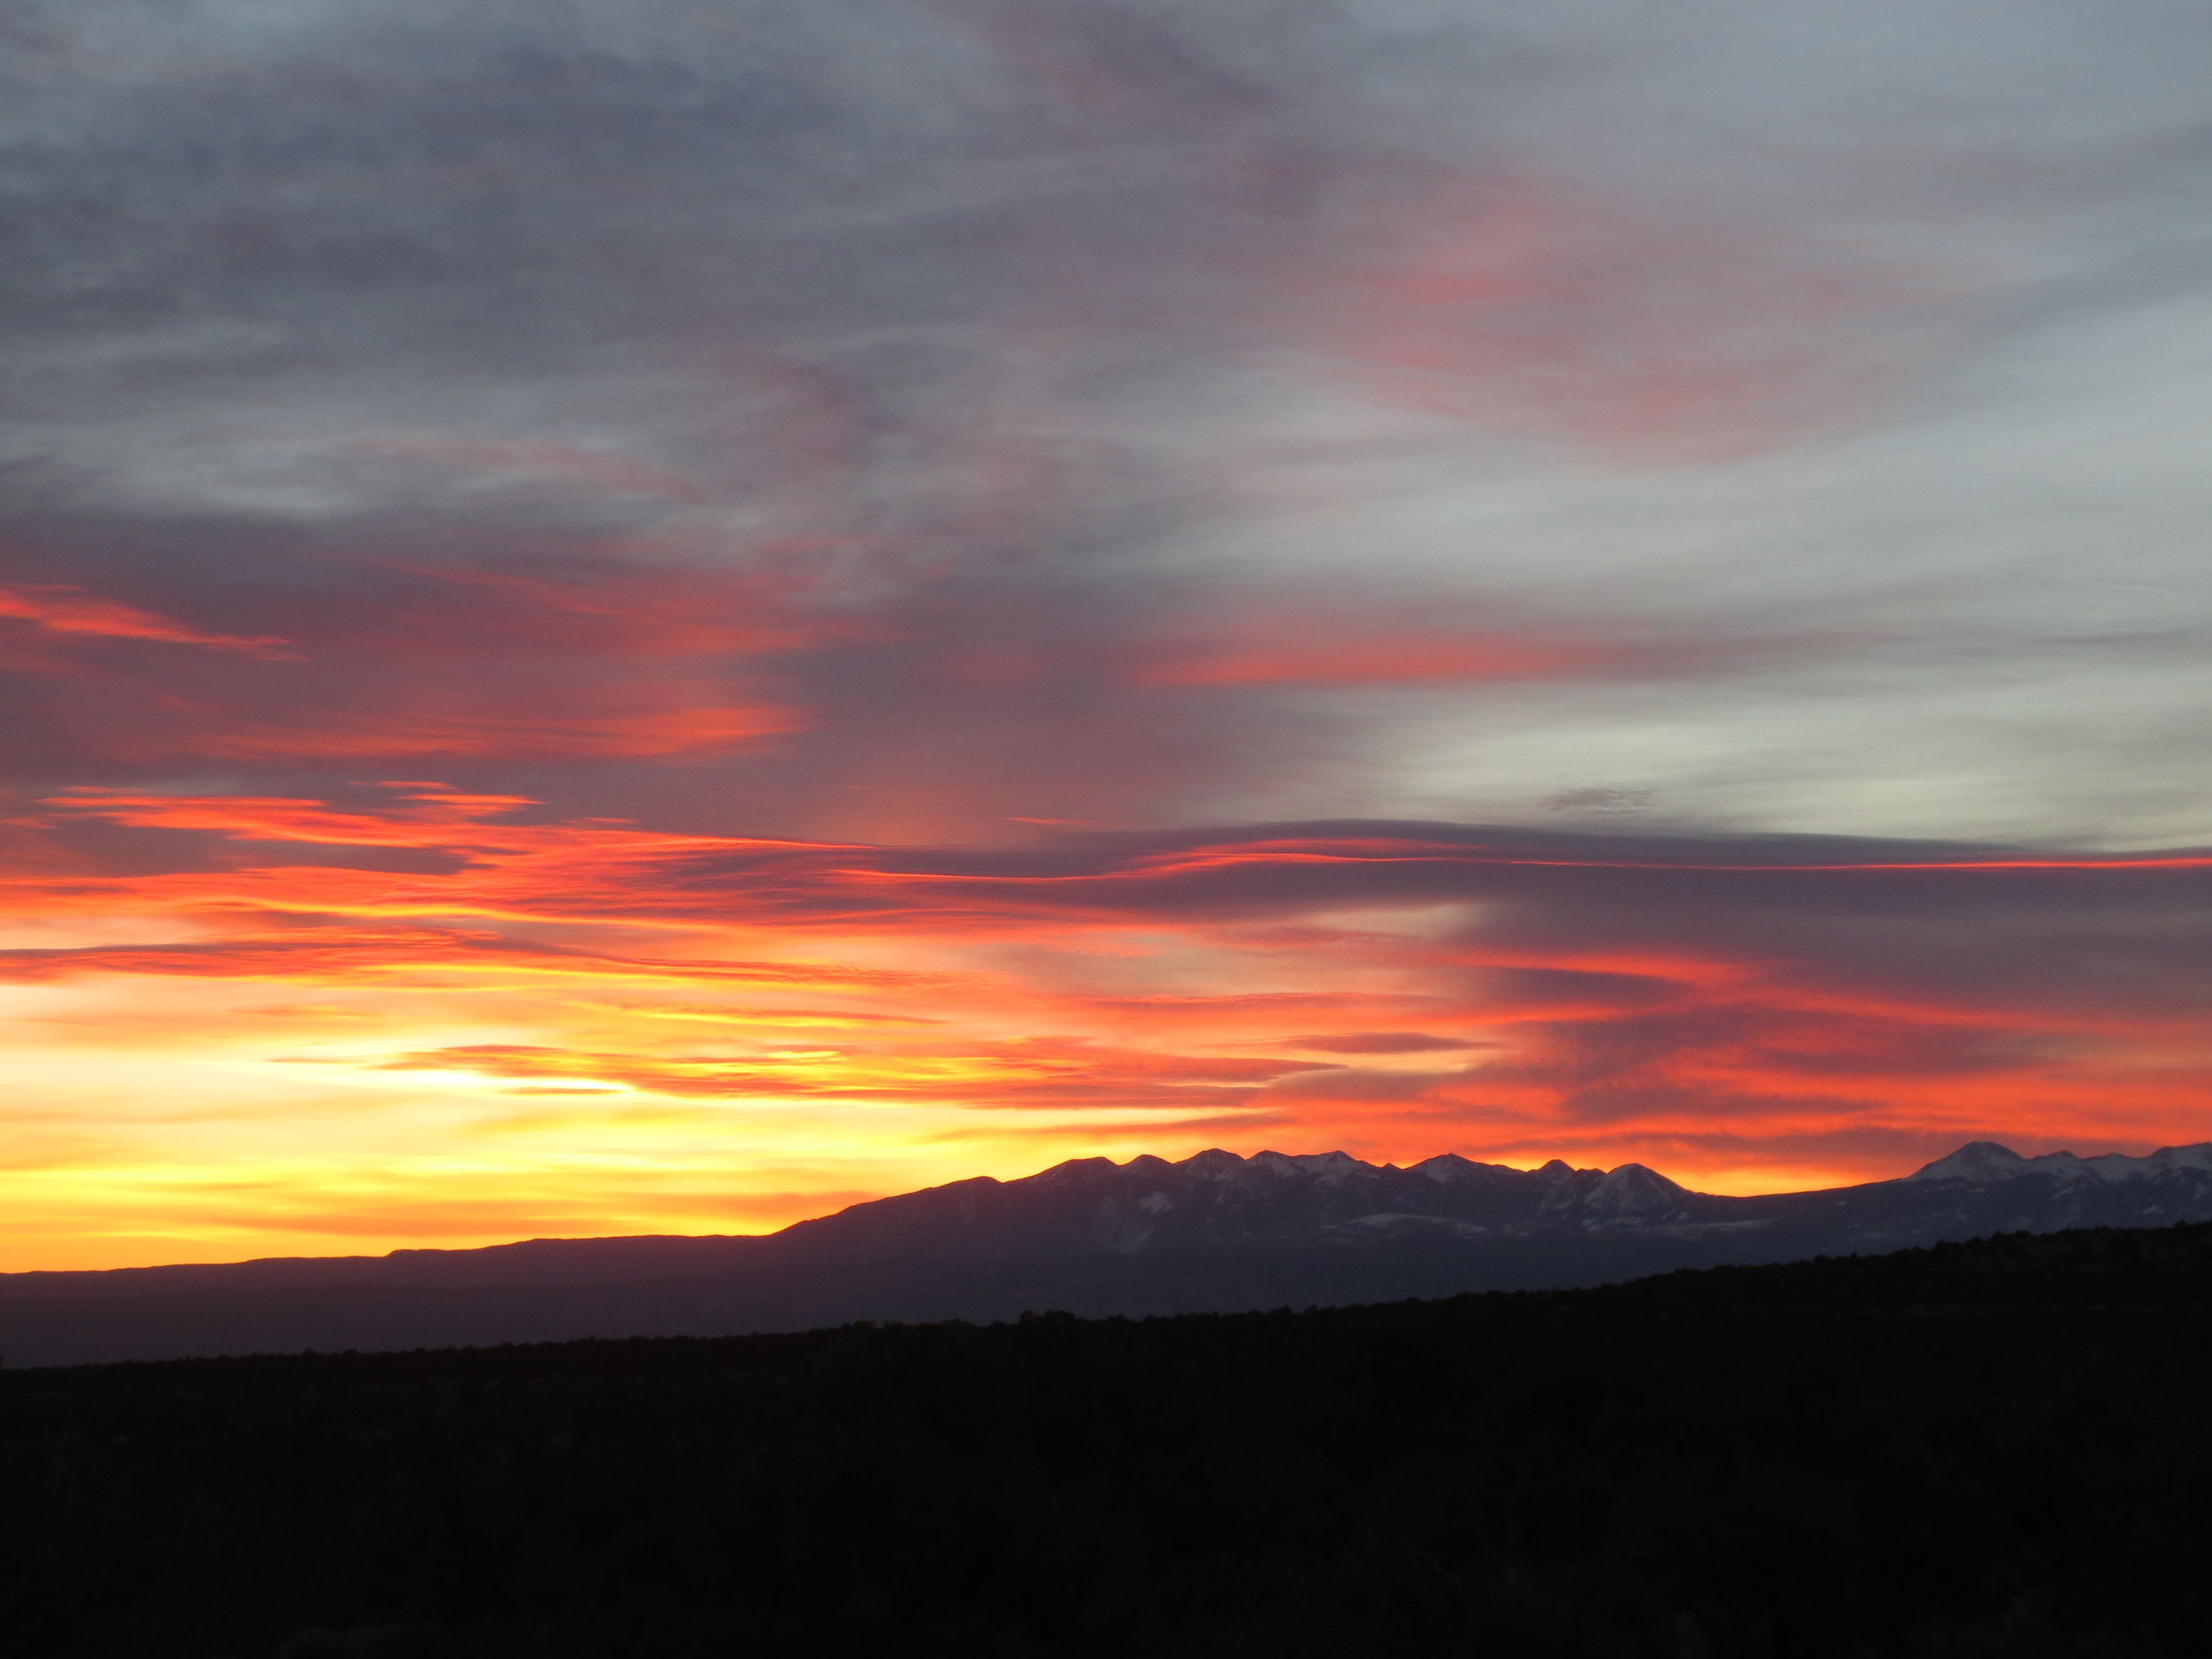 Sunrise the next day, over the La Sals